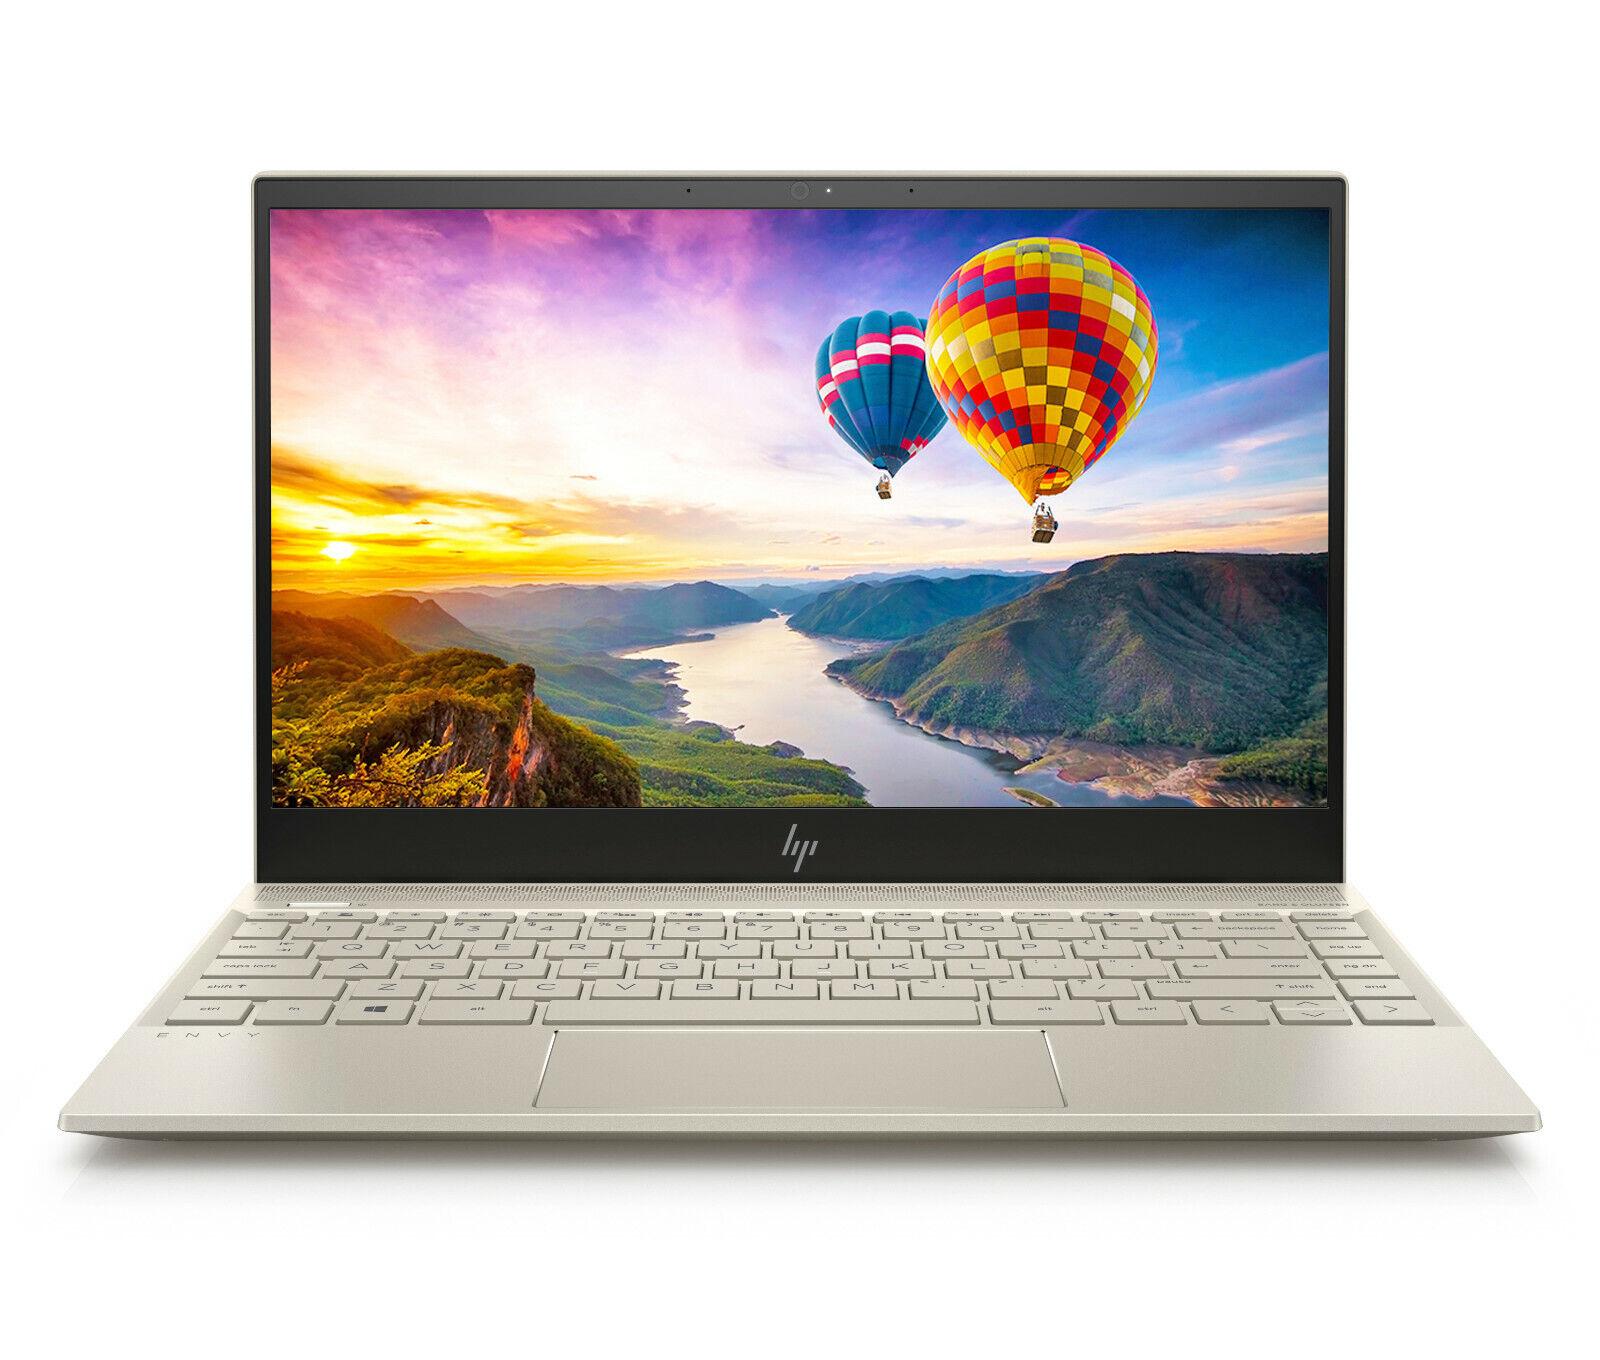 NEW HP X360 15.6 FHD Touch Intel i3-8130U 1TB HDD 16GB Optan